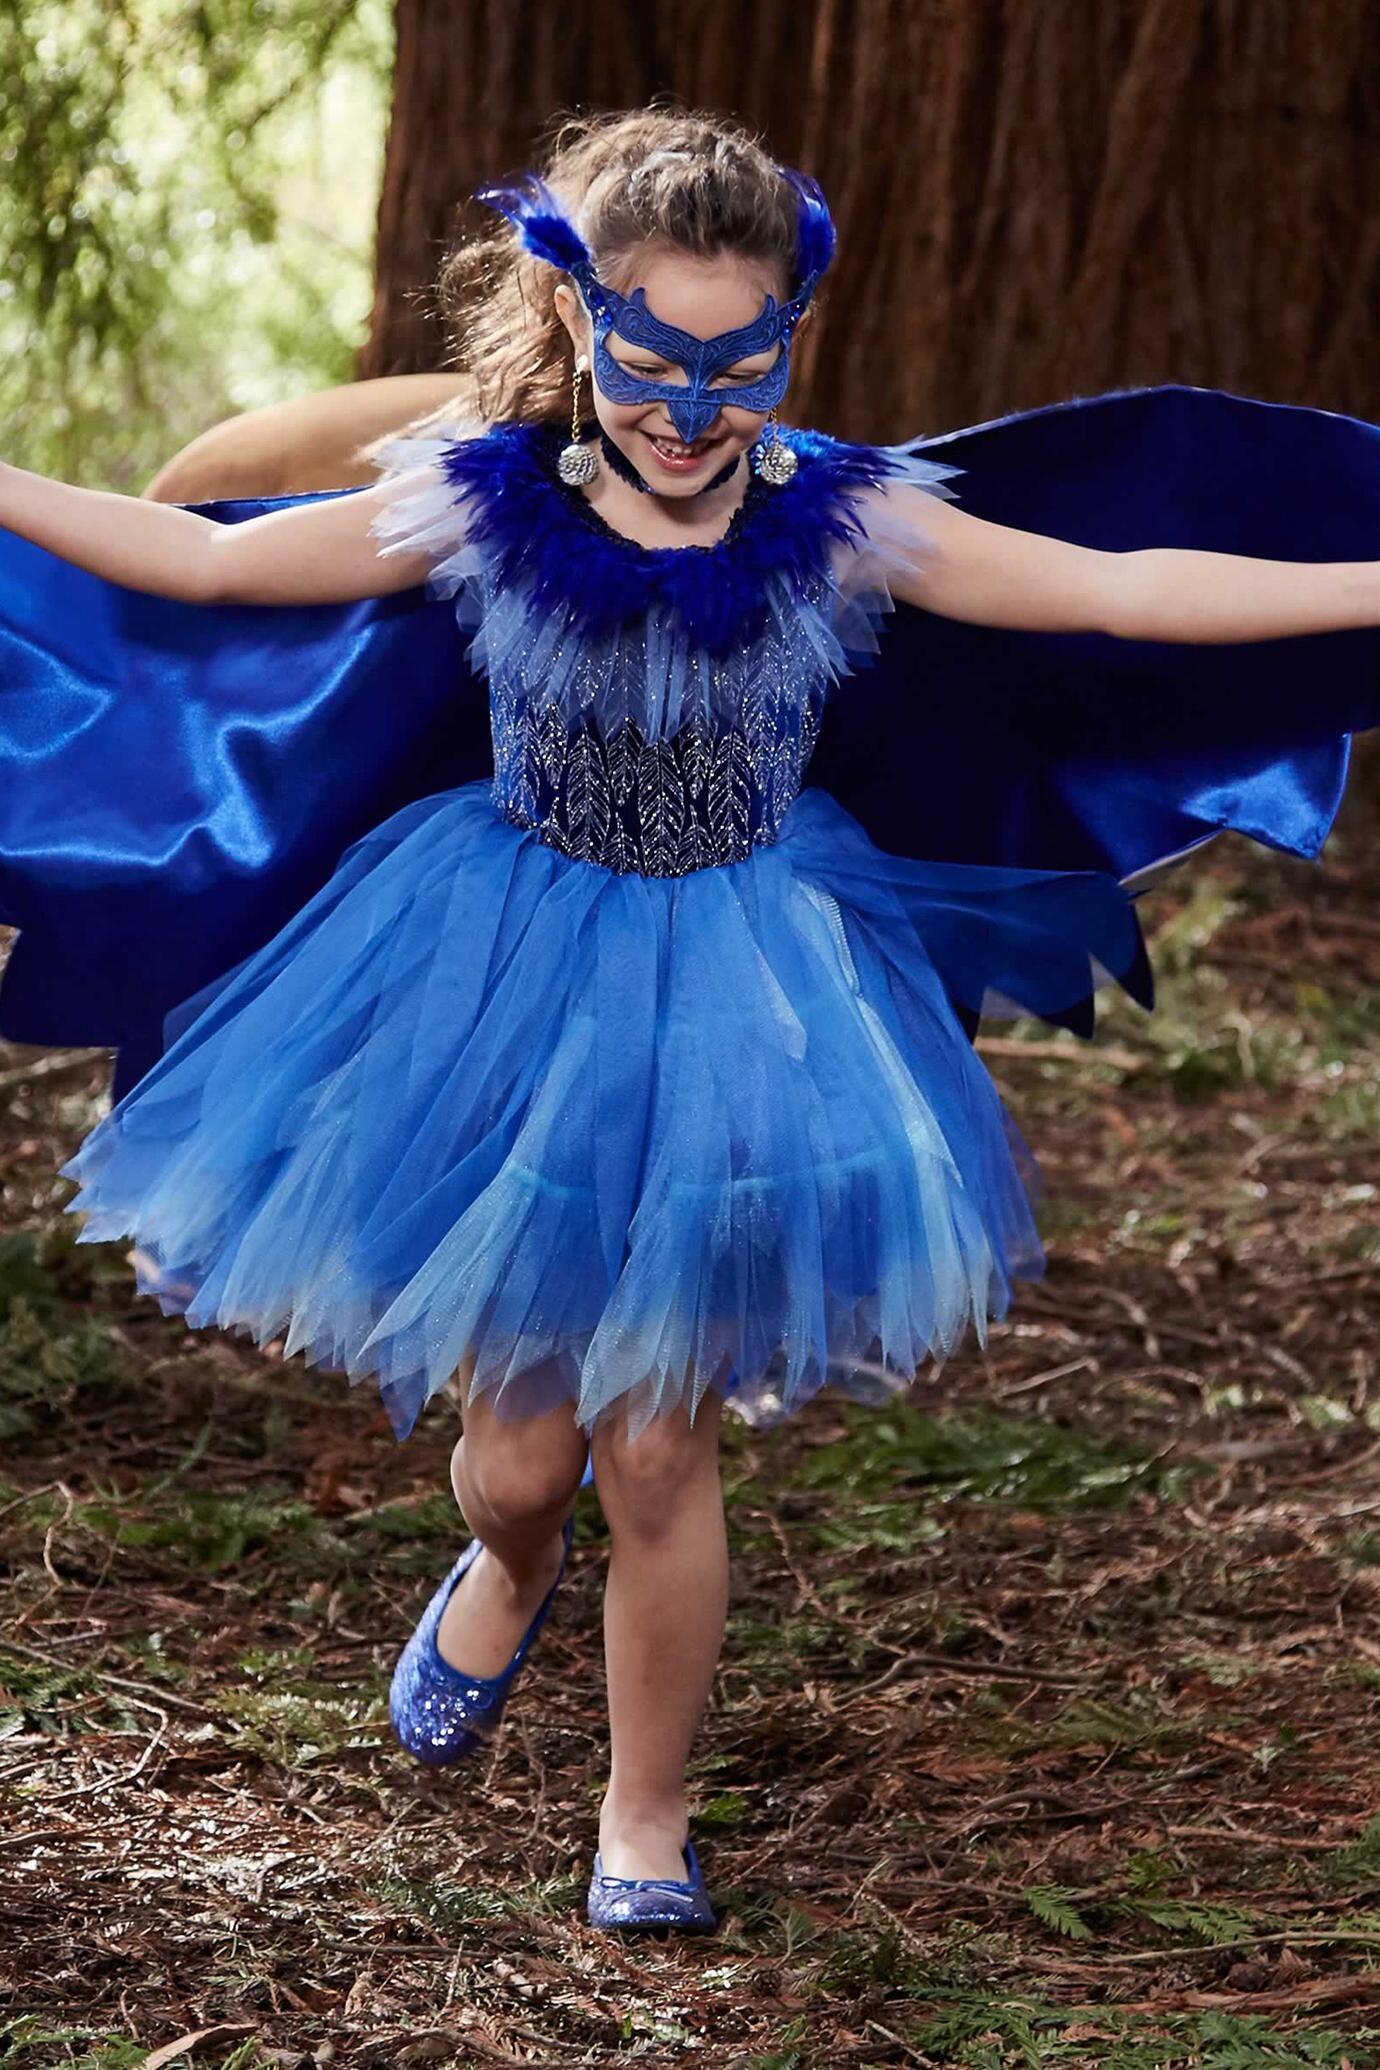 Pretty Bluebird Costume For Girls   Chasingfireflies  92.00 43e8179471a0